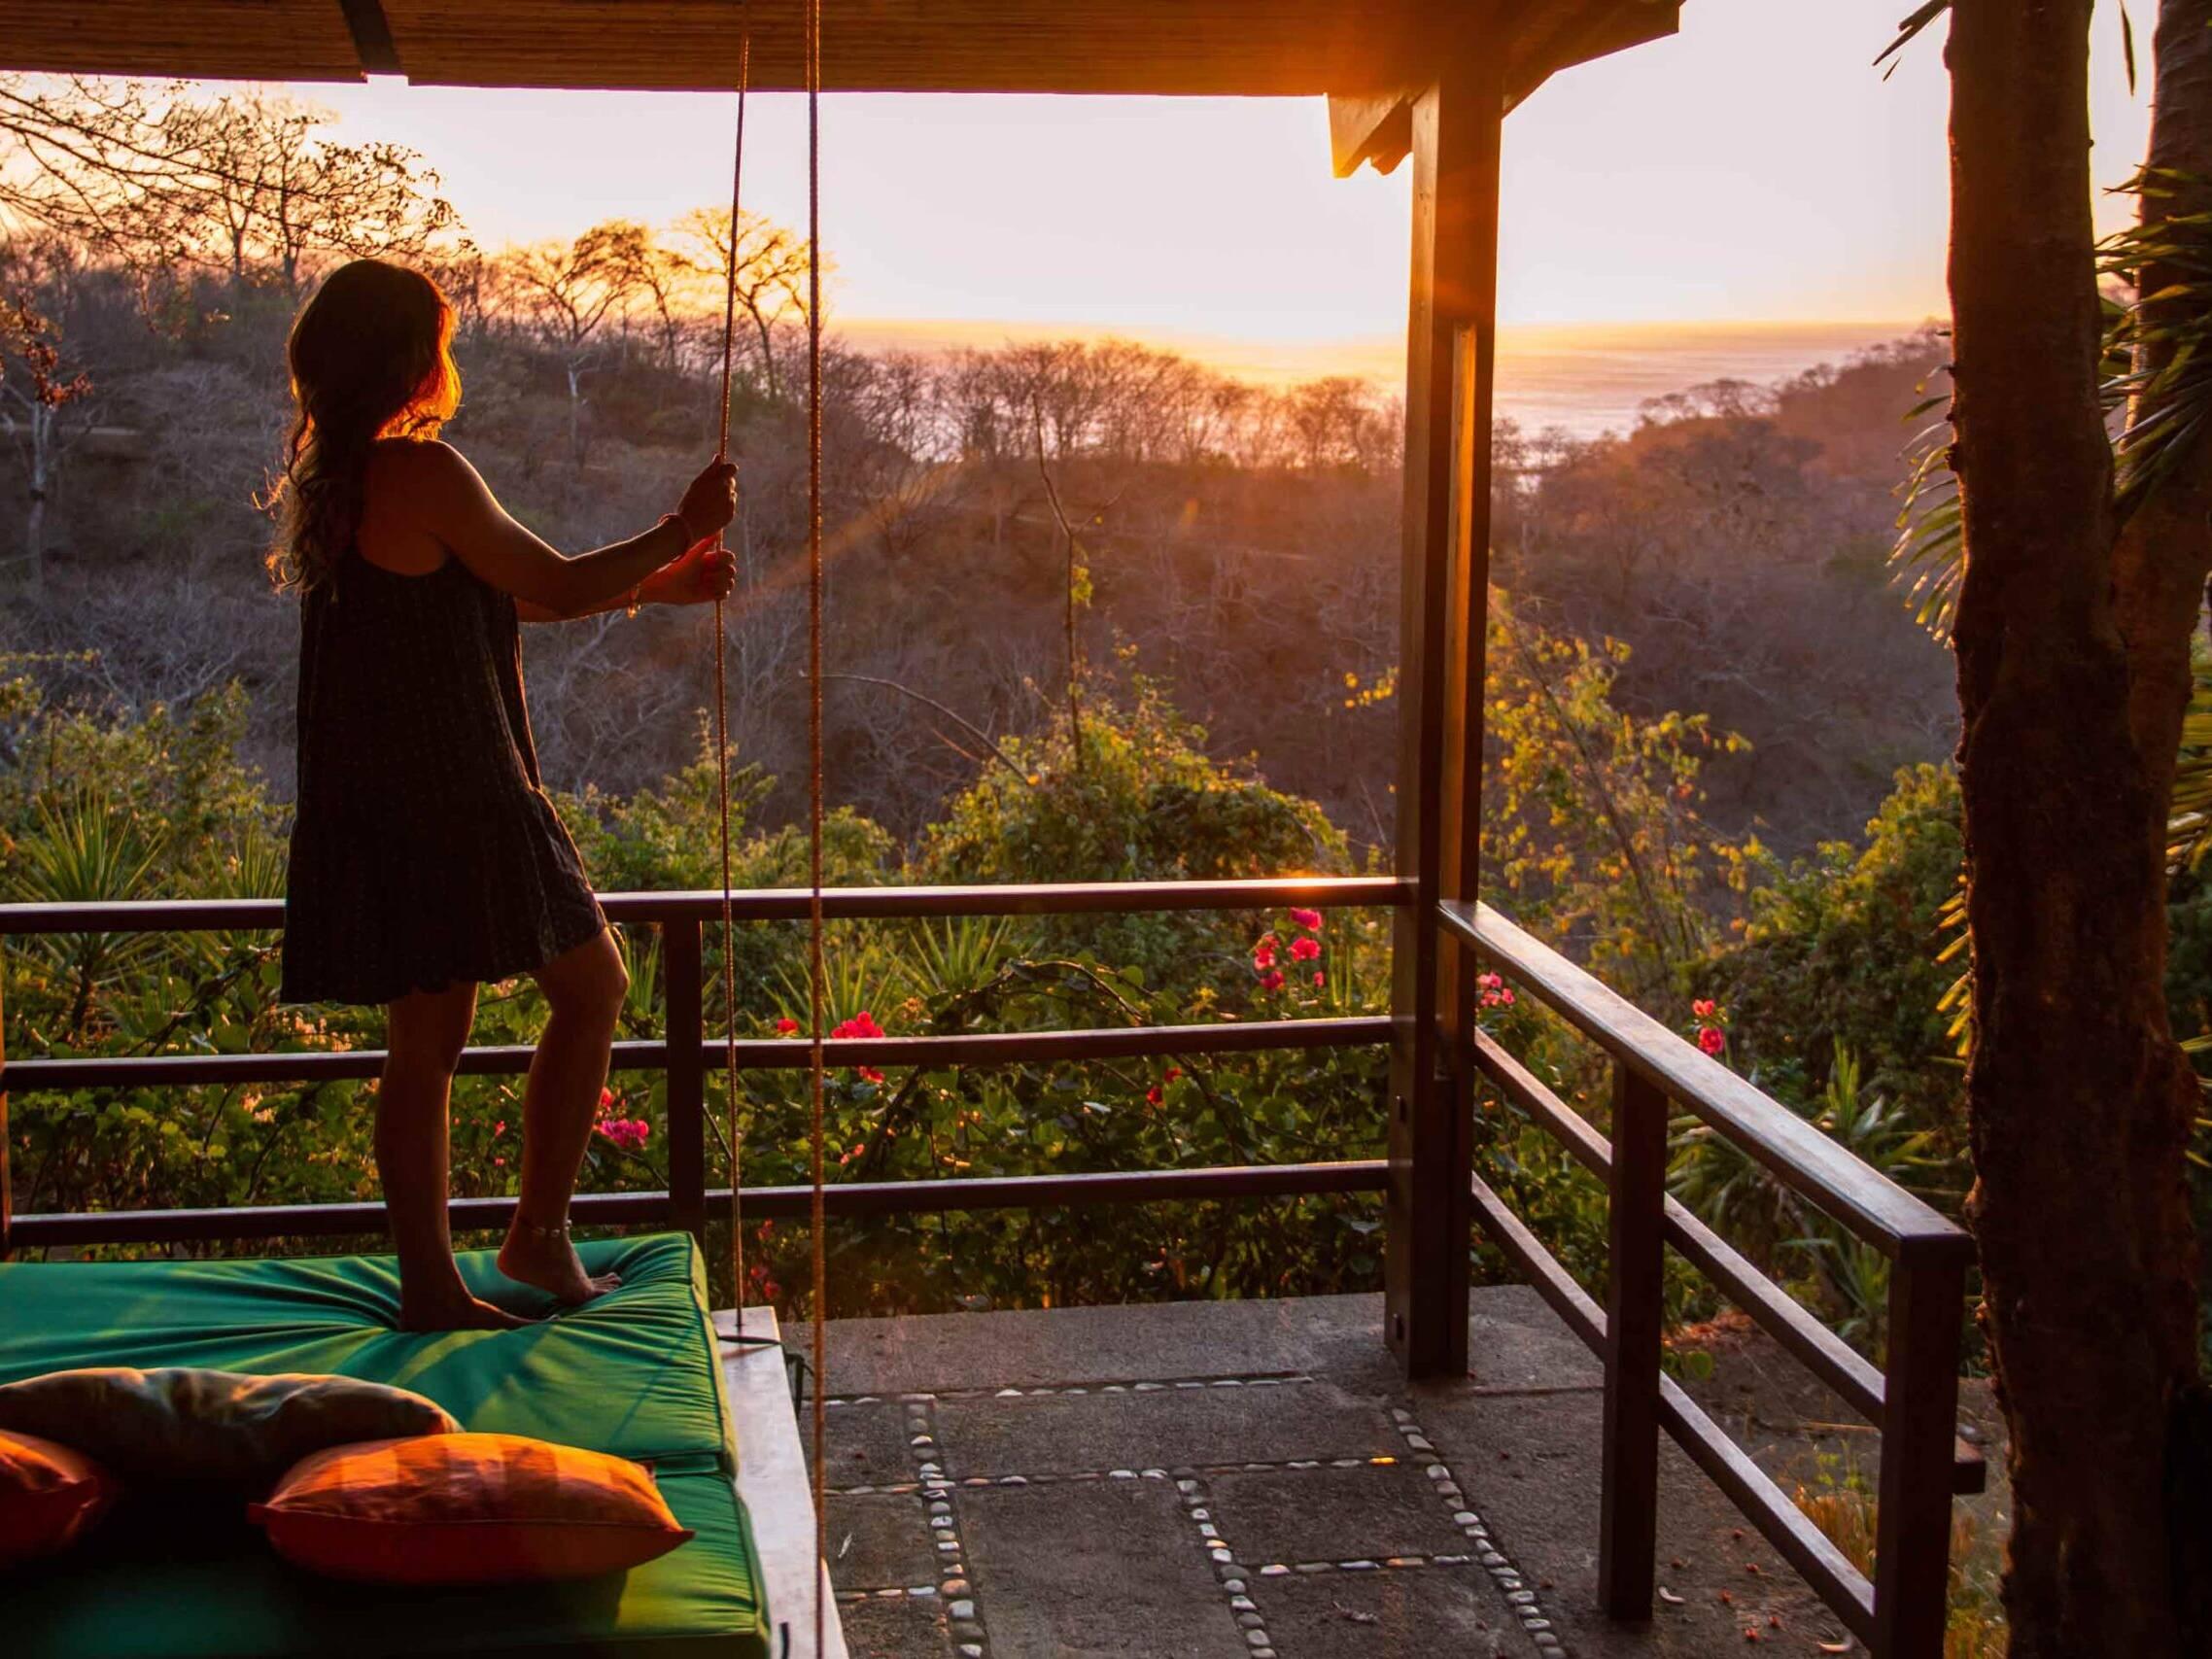 Sunset view from the terrace at Balcones de Majagual Nicaragua